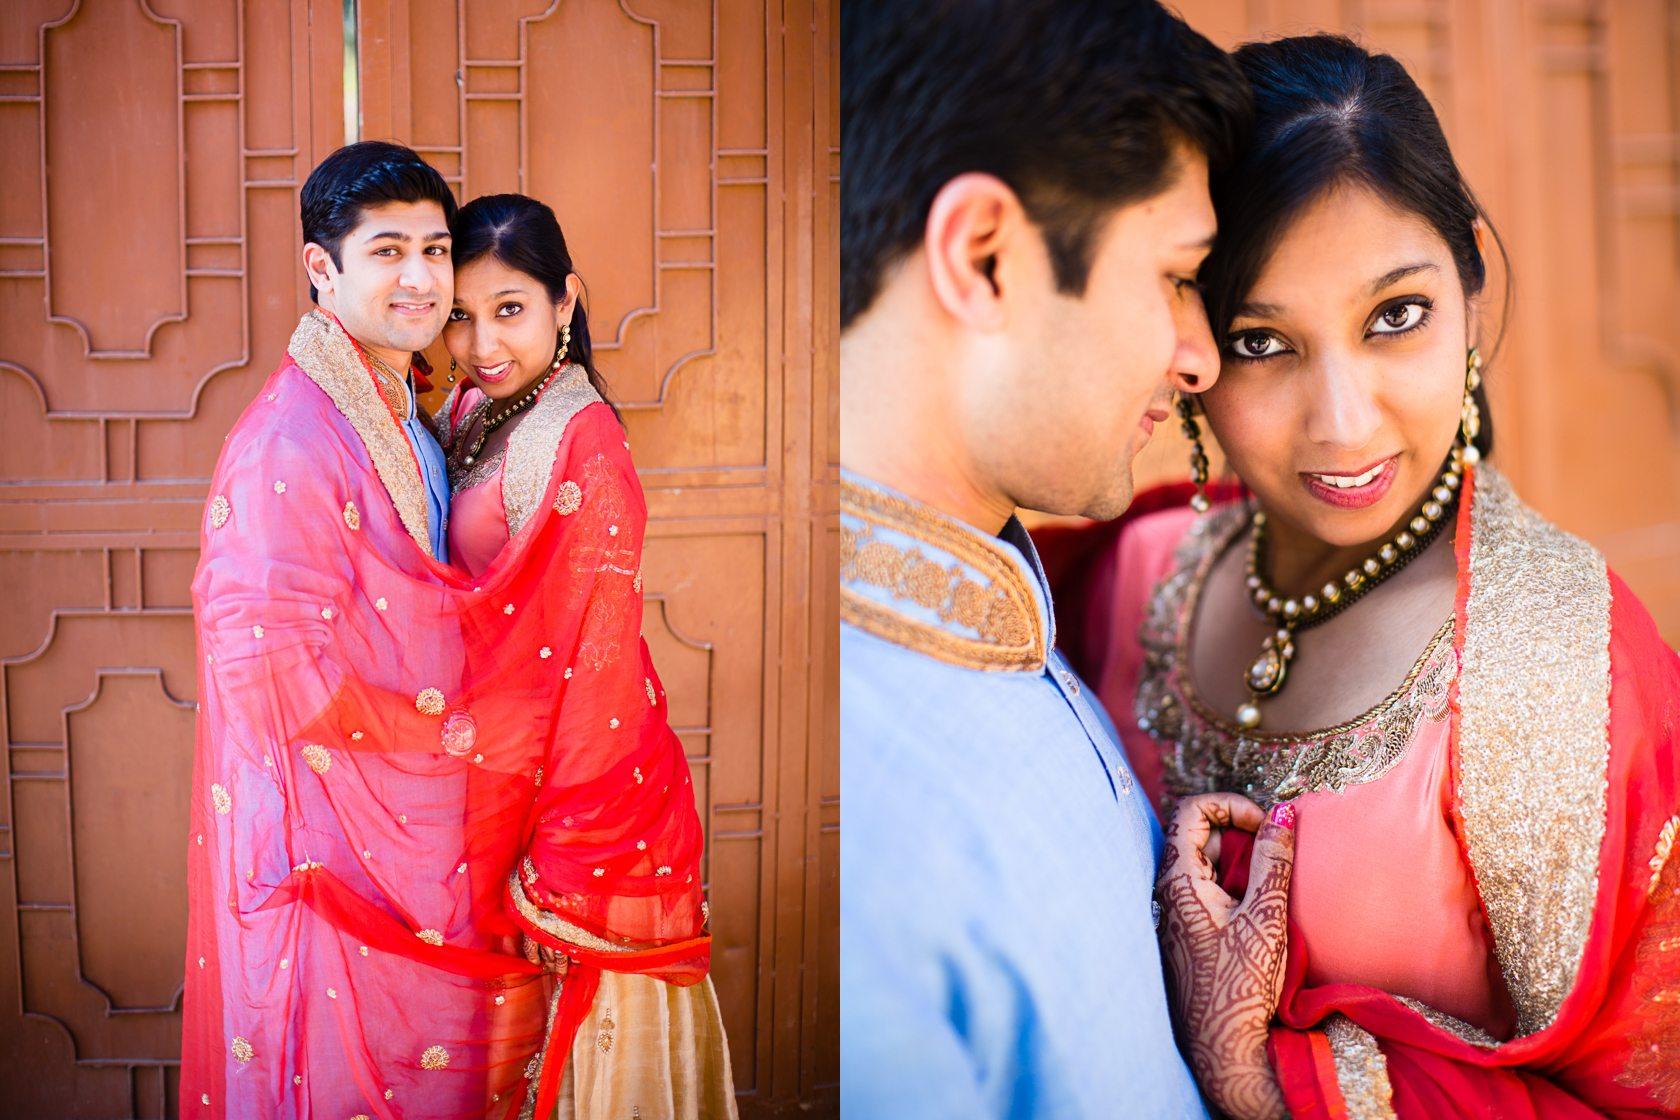 India_Wedding_288.jpg